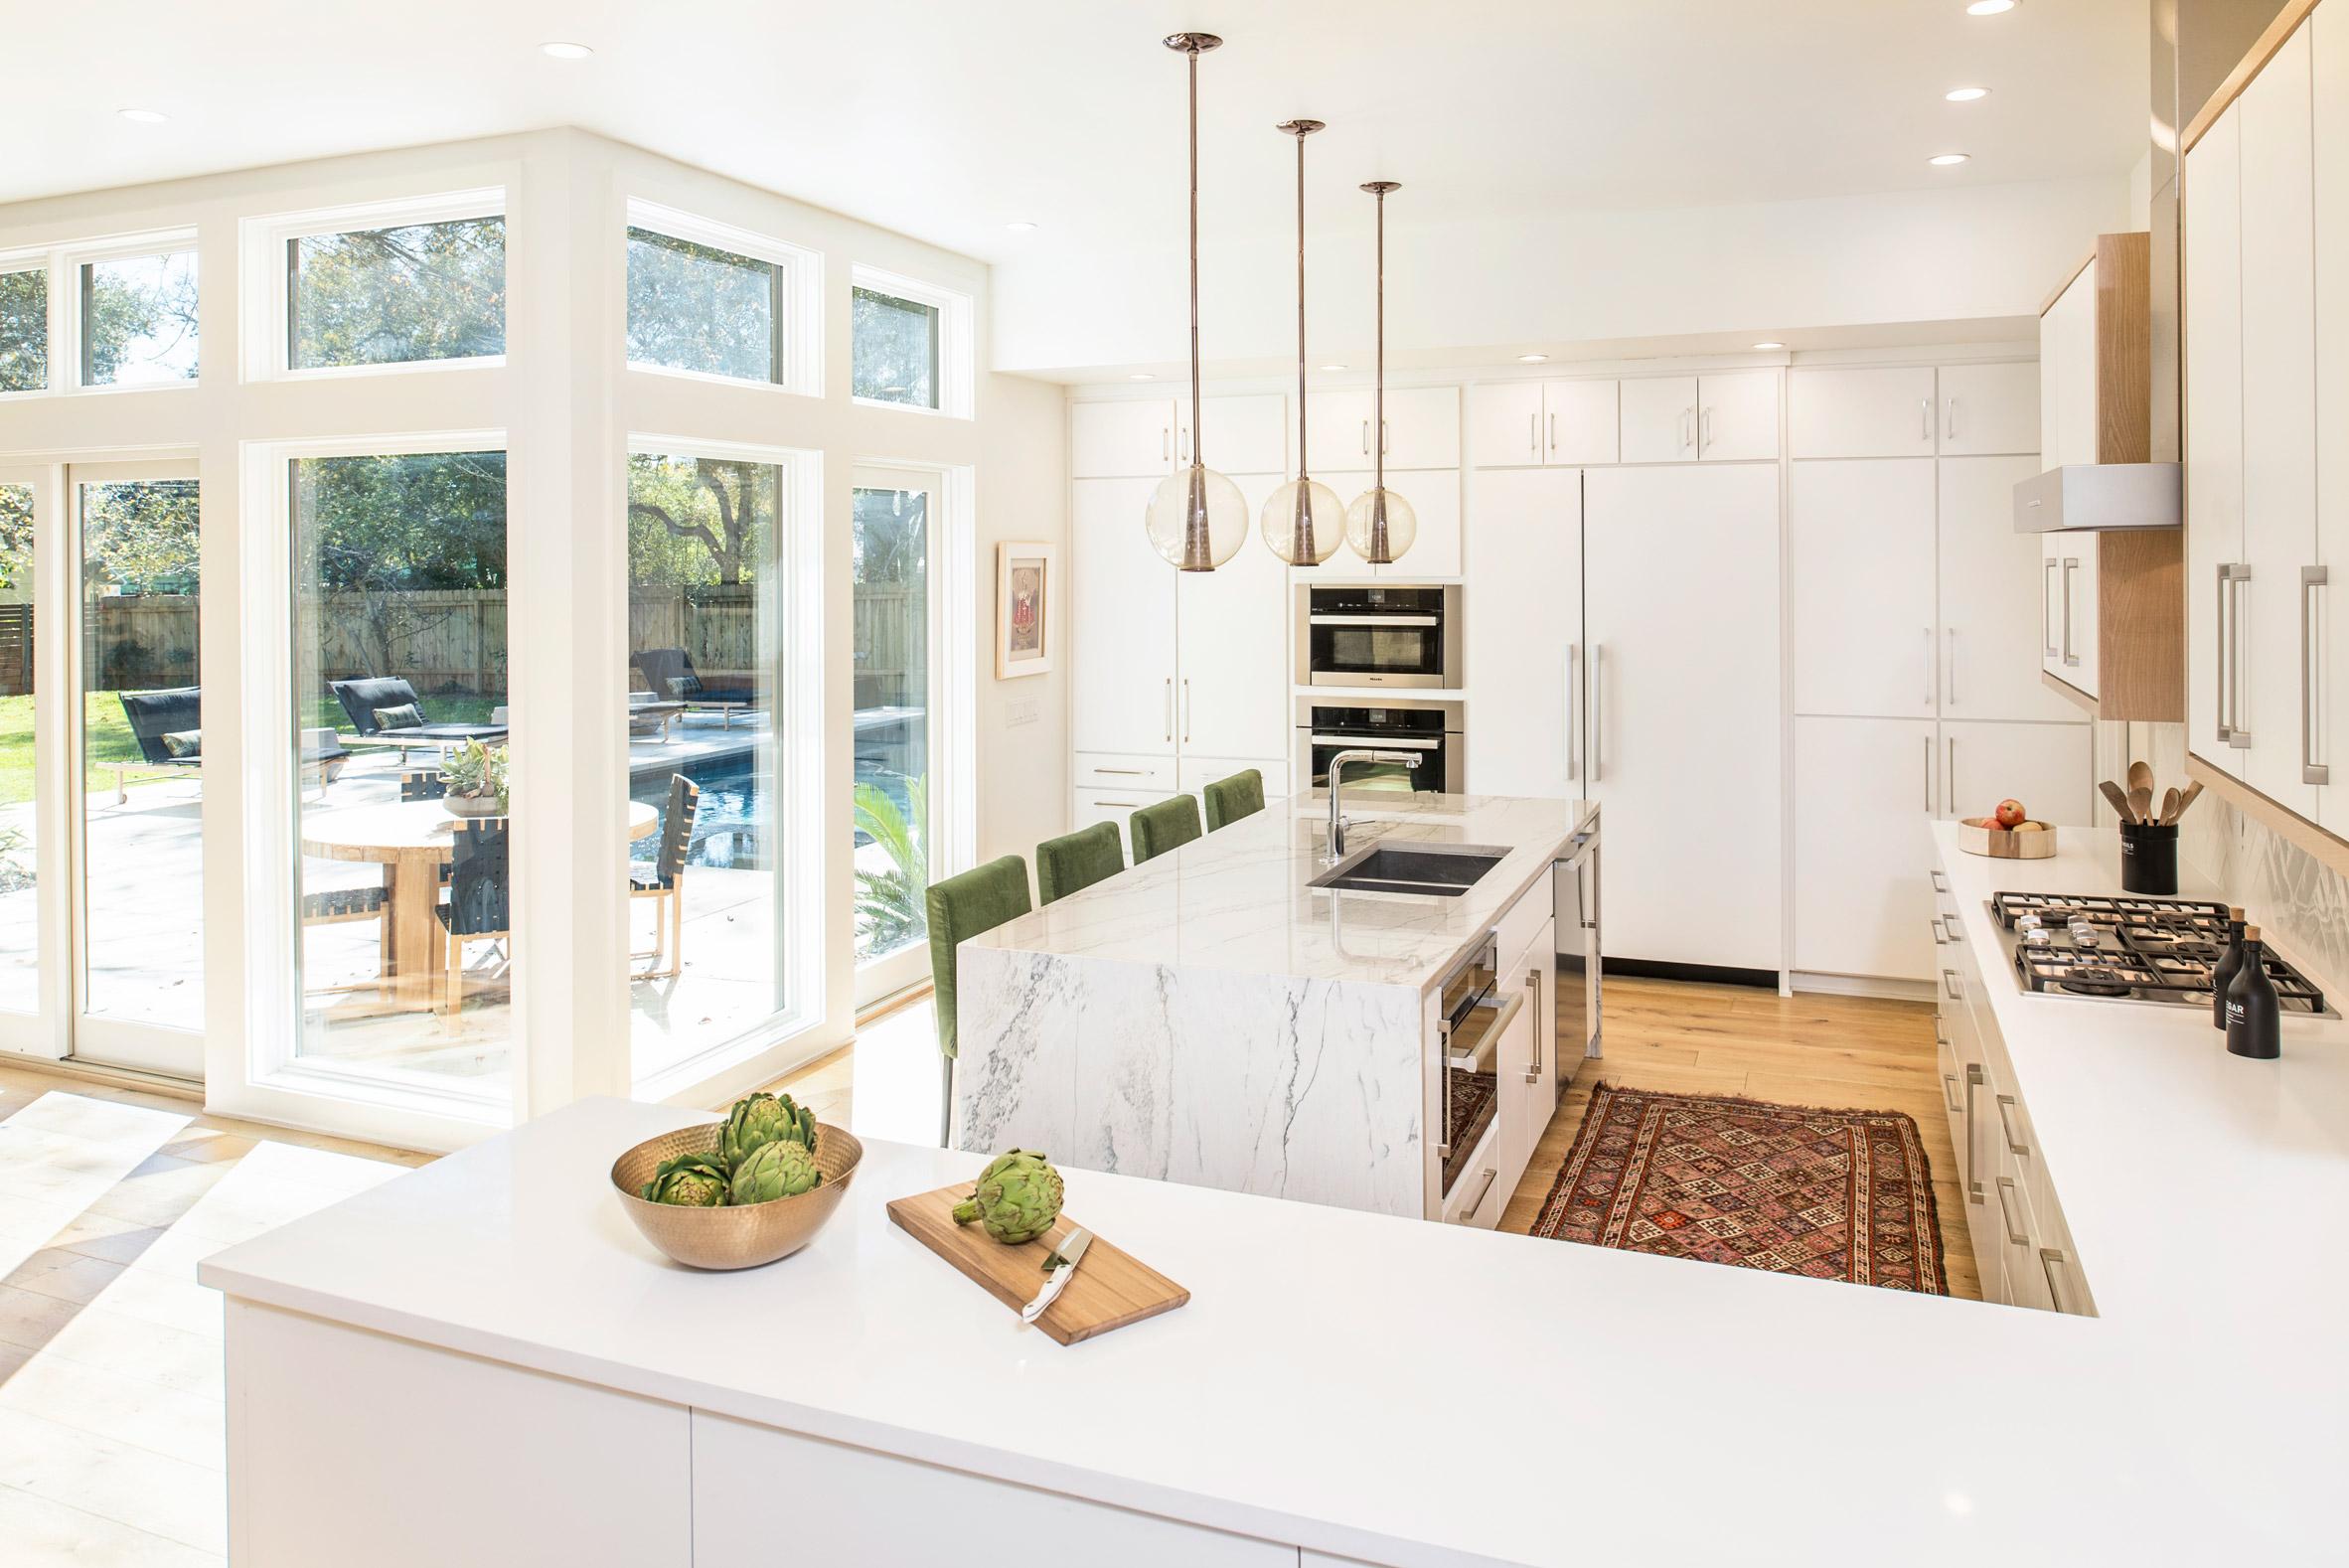 laurelwood-house-residence-home-austin-texas-usa-architecture_dezeen_12.jpg